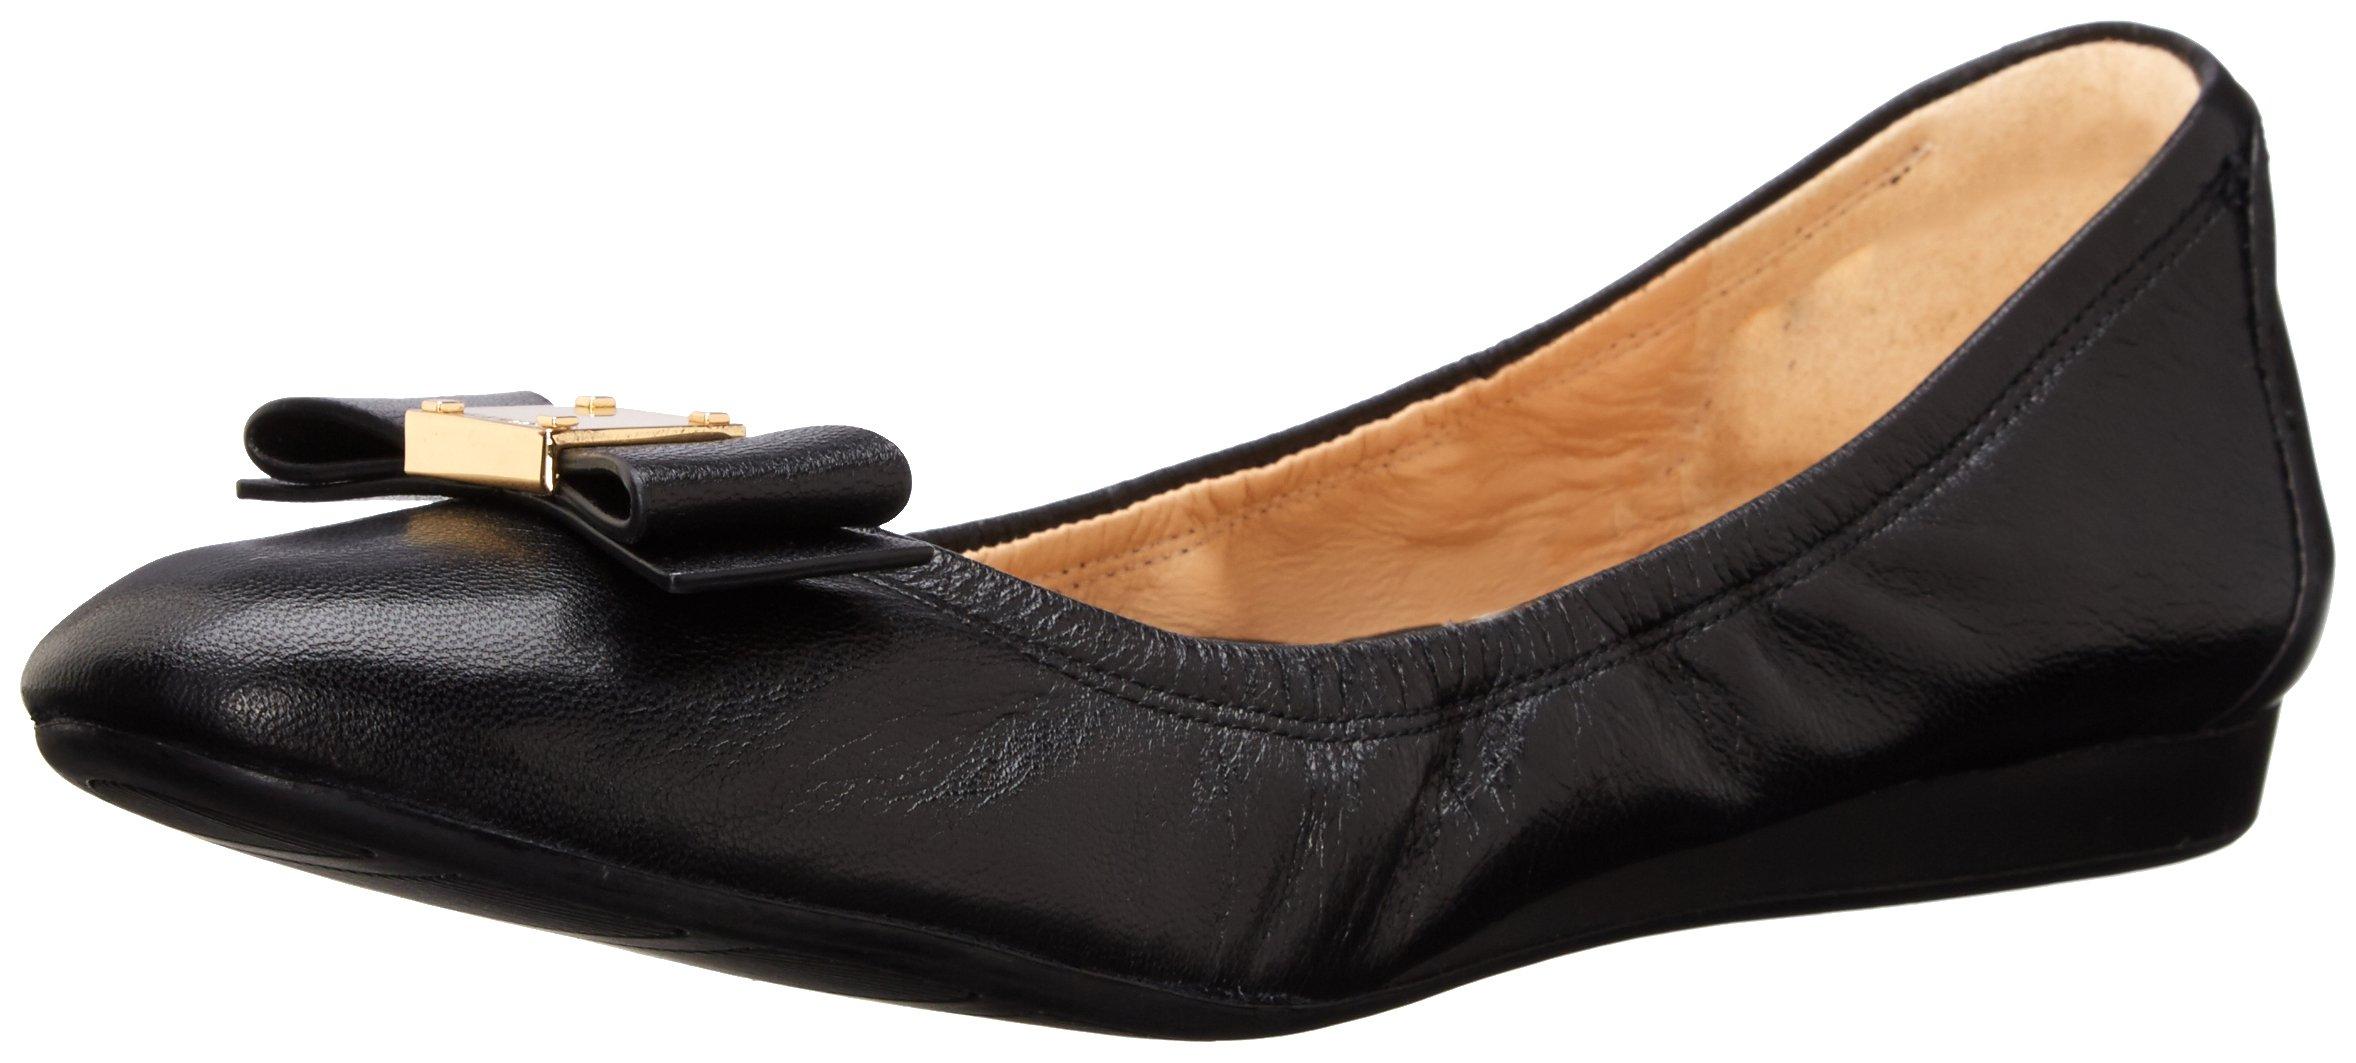 Cole Haan Women's TALI BOW BALLET Shoe, Black Leather, 9 B US